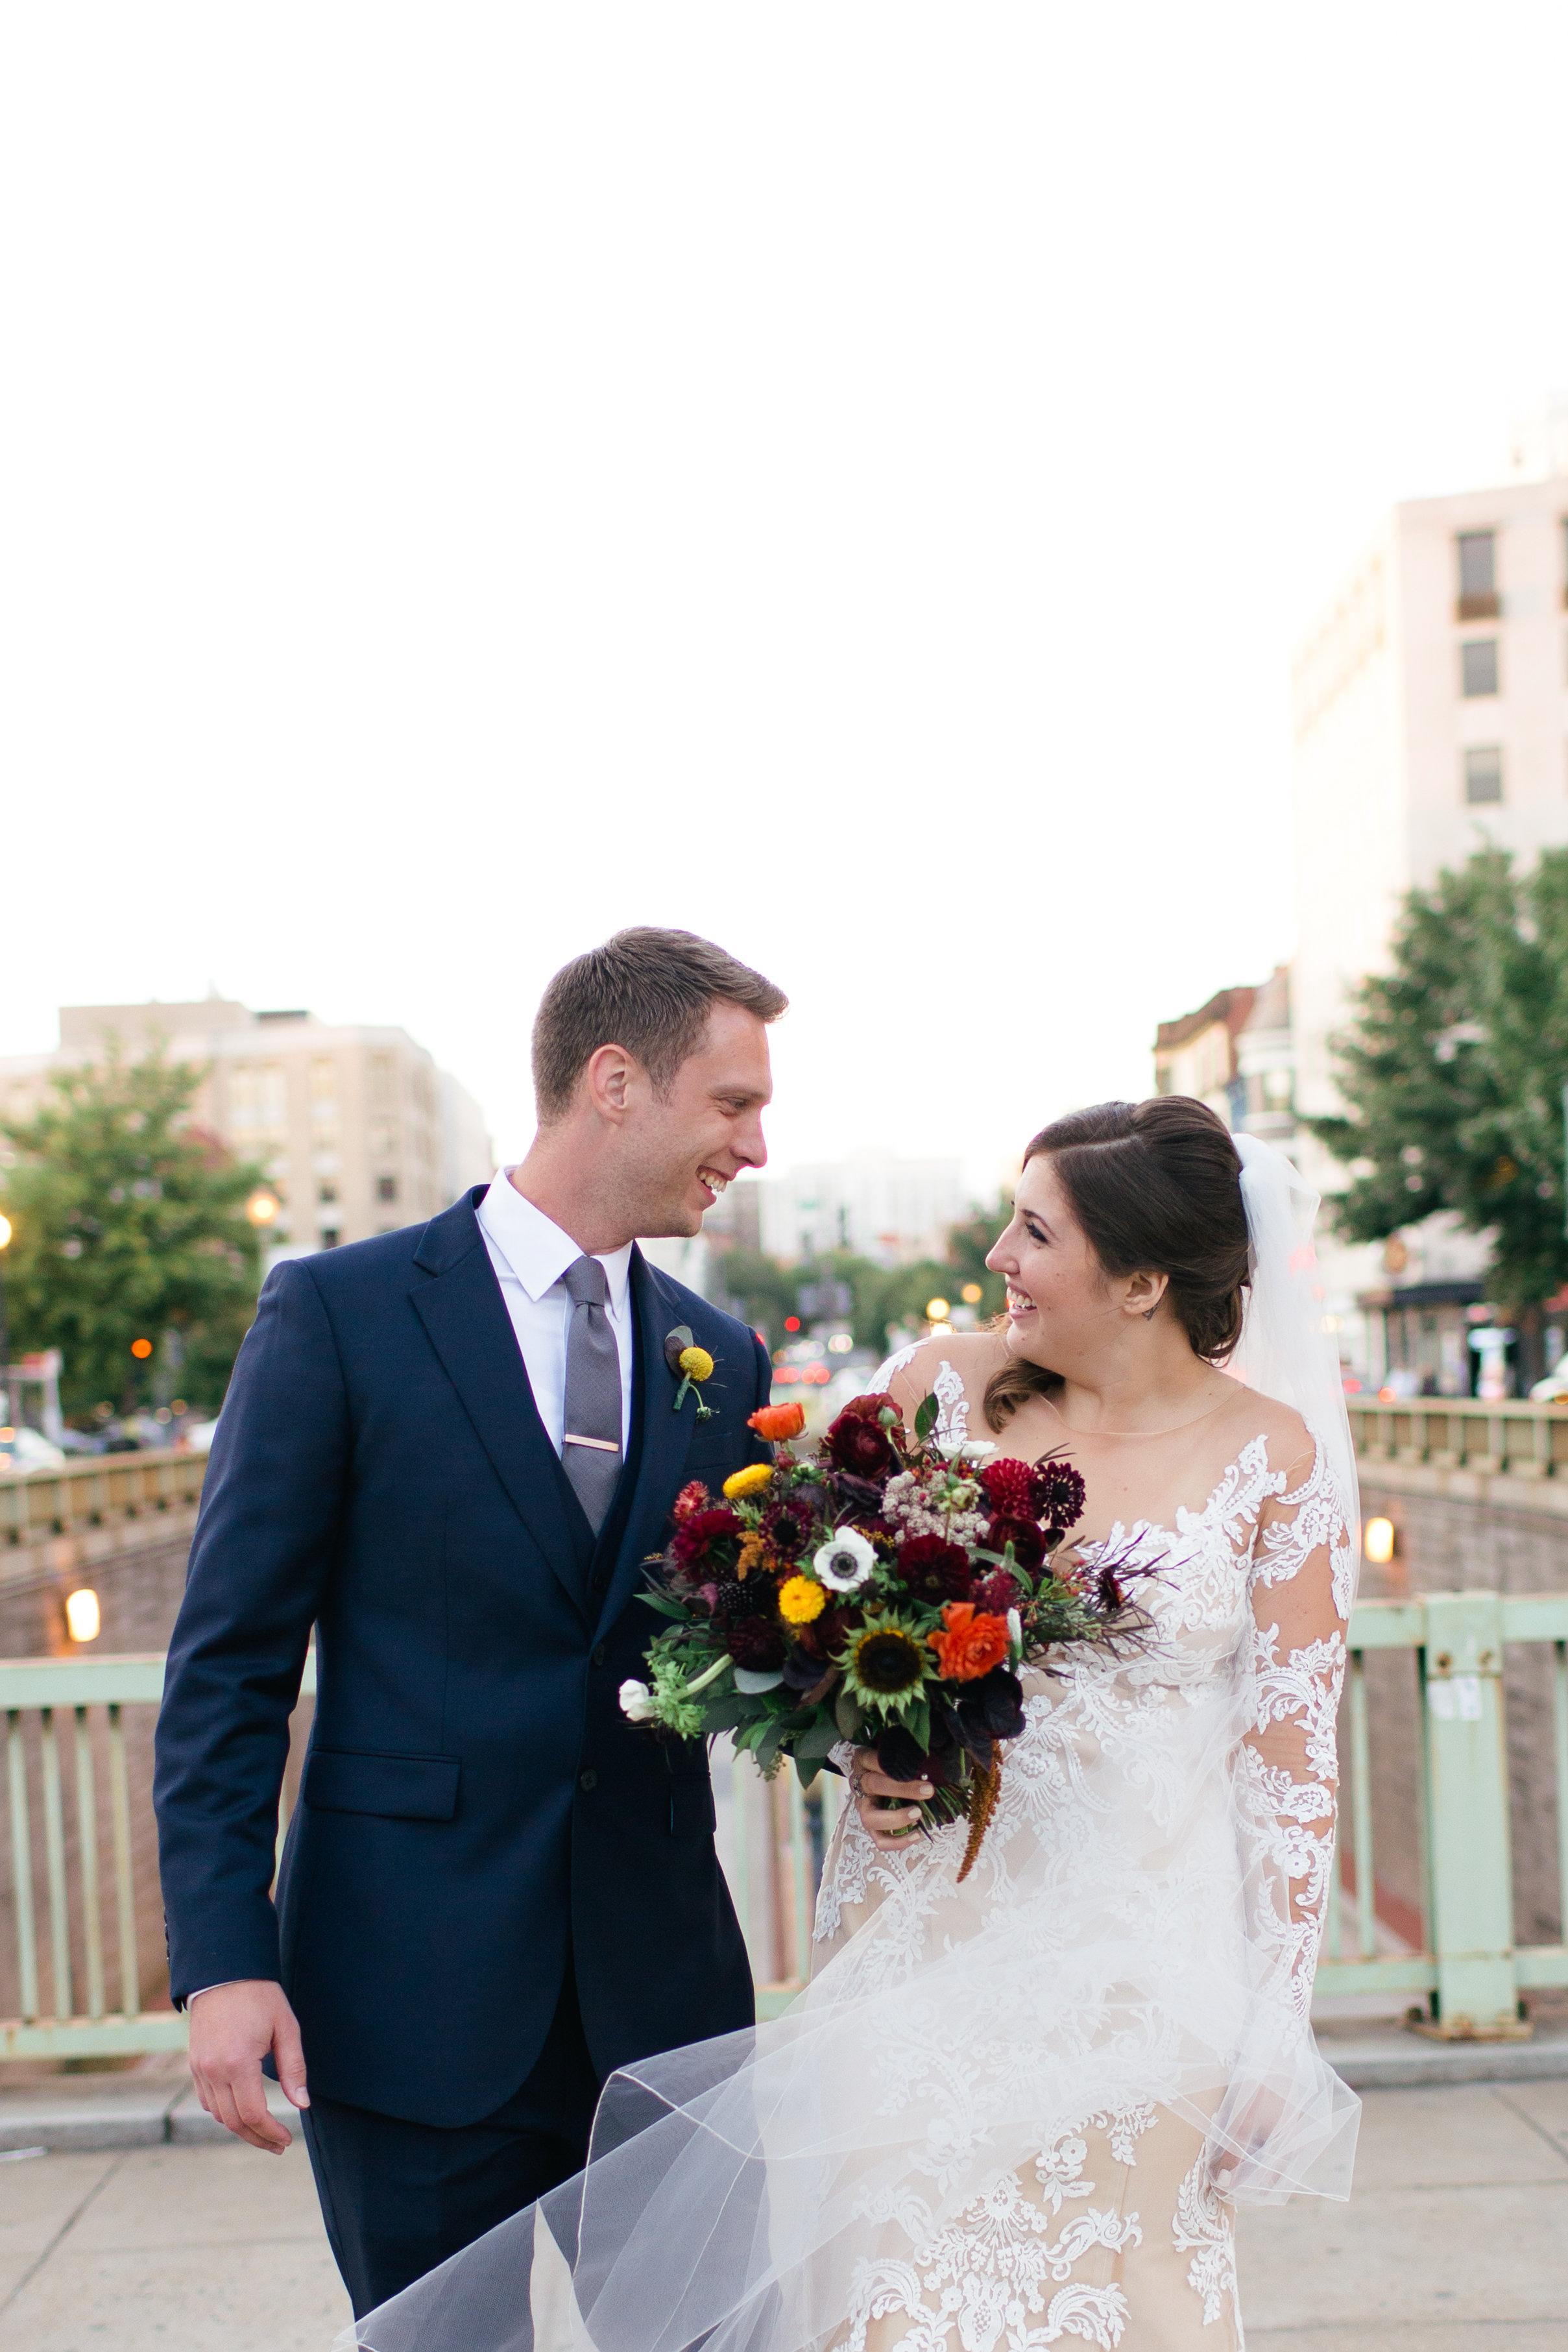 Dupon Circle Wedding | Washington DC Wedding Photography | Rebecca Wilcher Photography -31.jpg